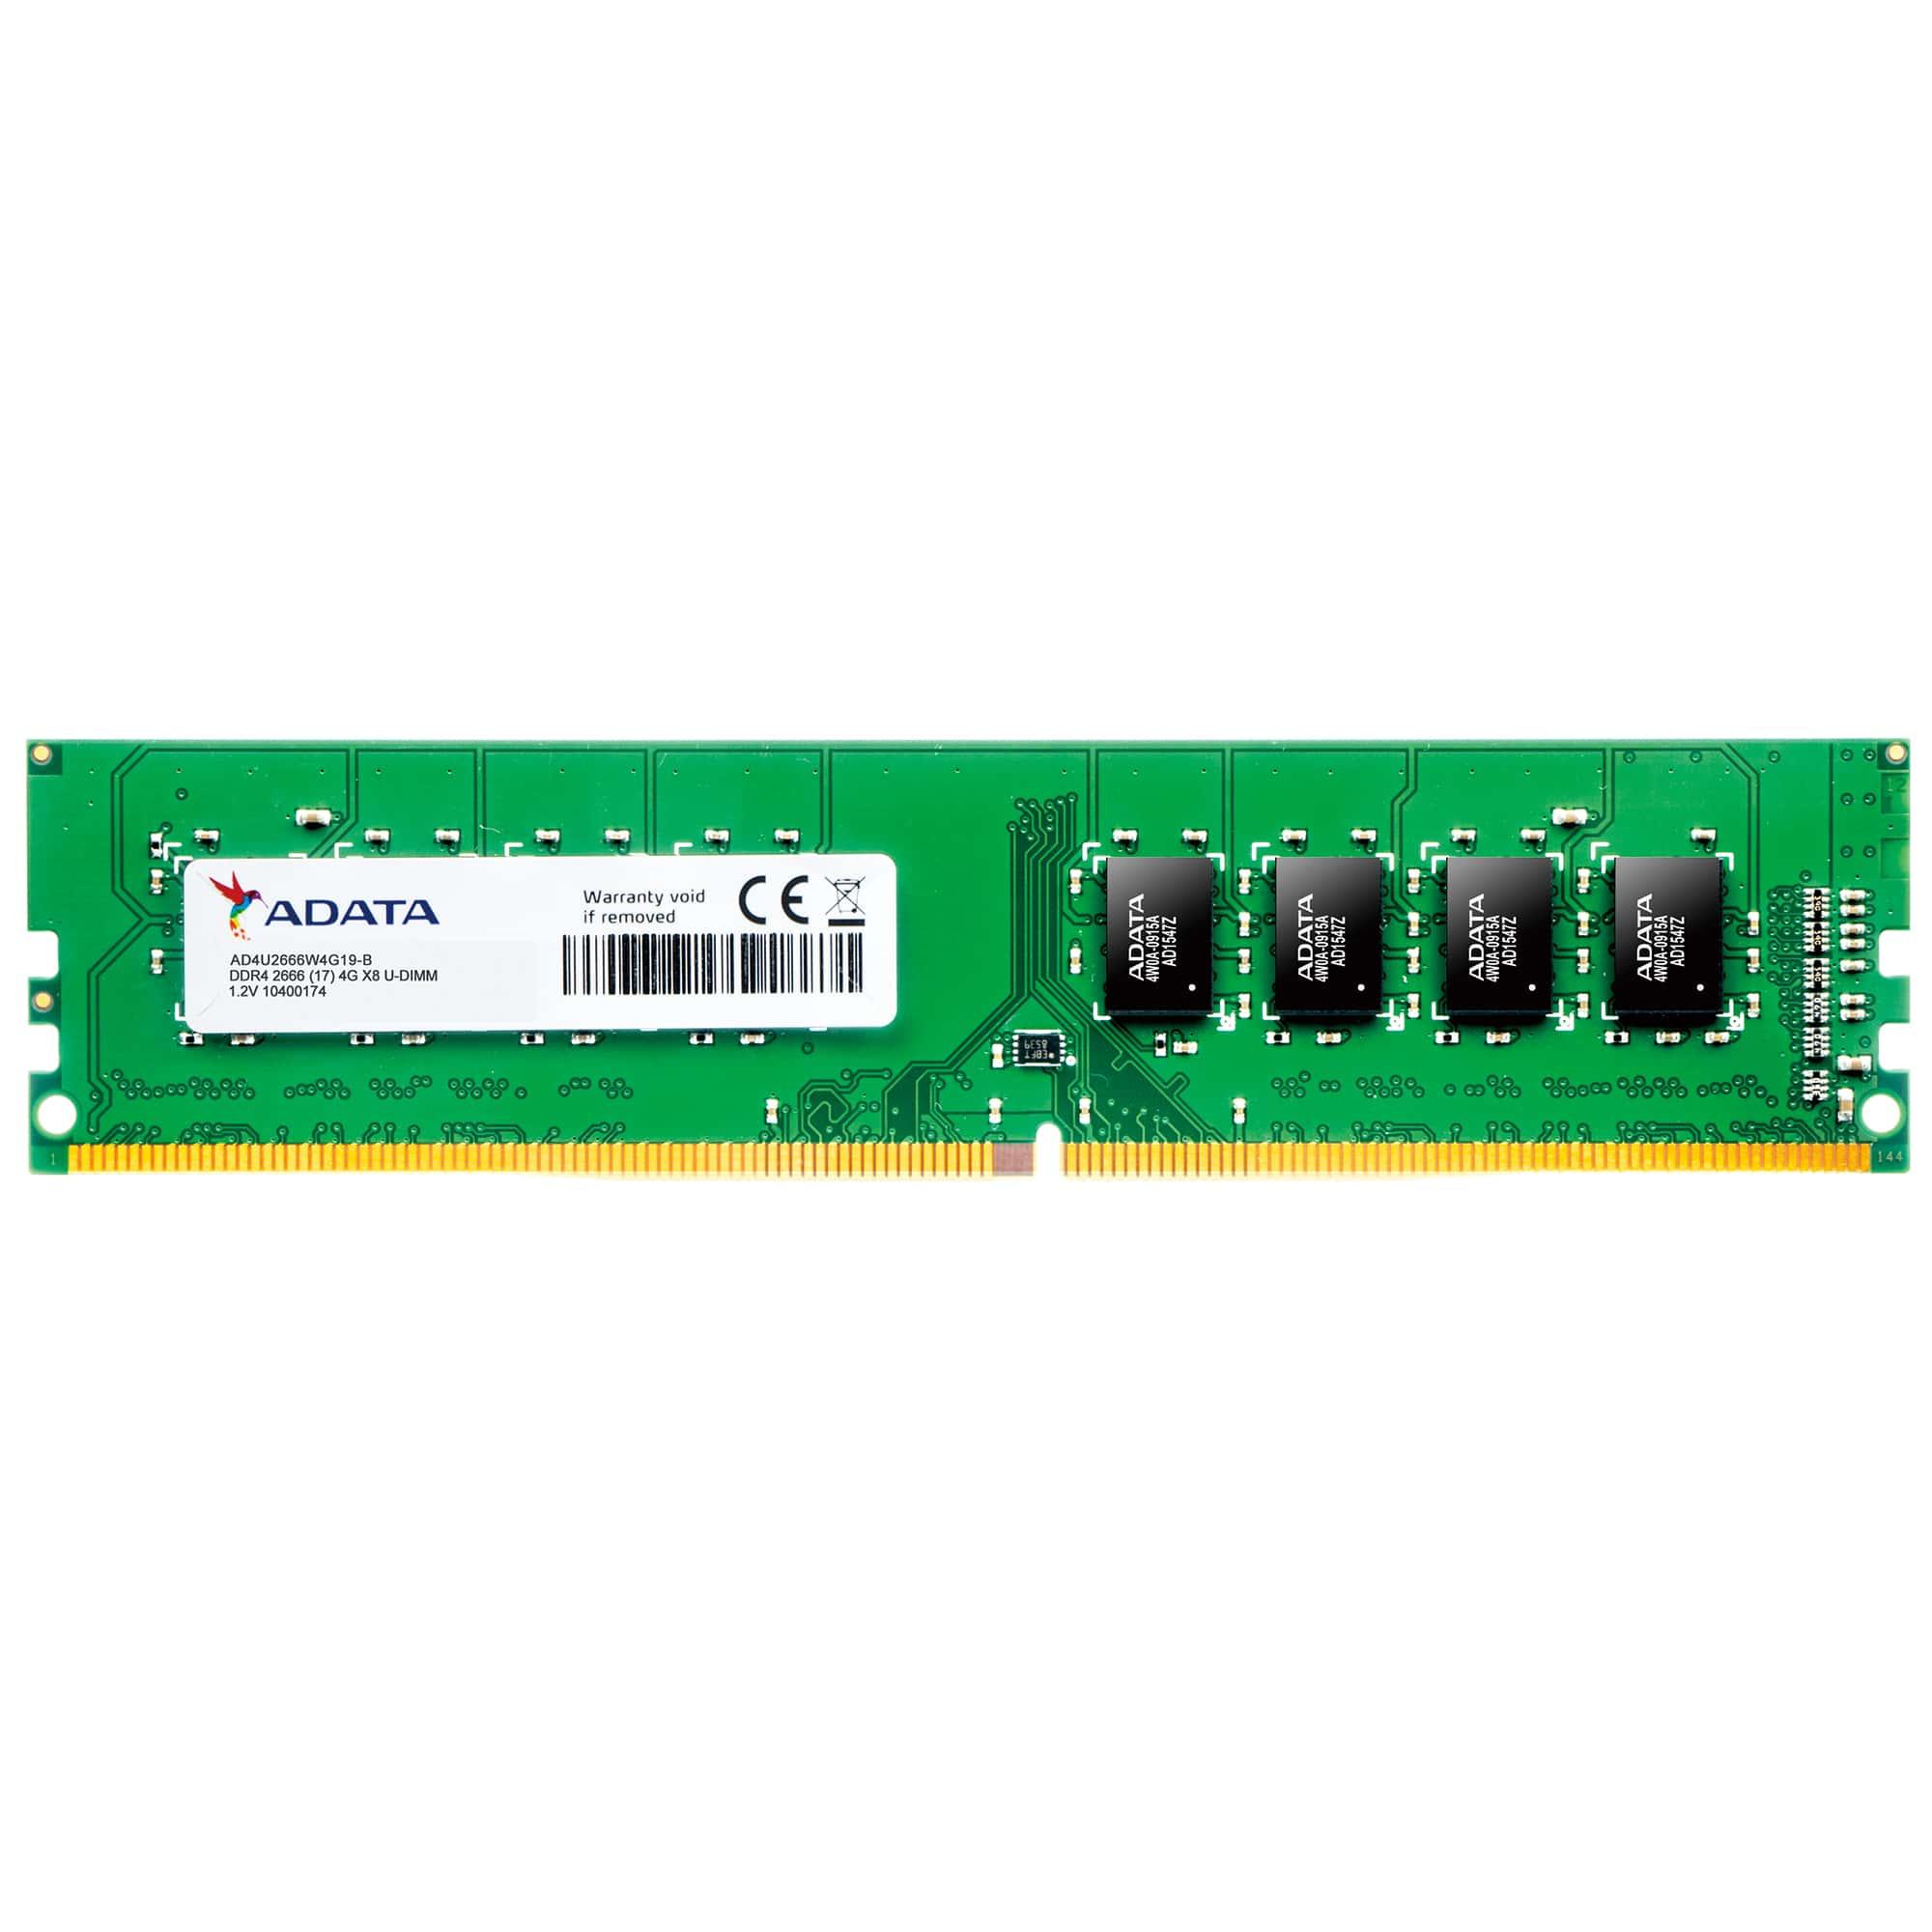 DIMM DDR4 4GB 2666MHz CL19 ADATA Premier, 512x16, Retail